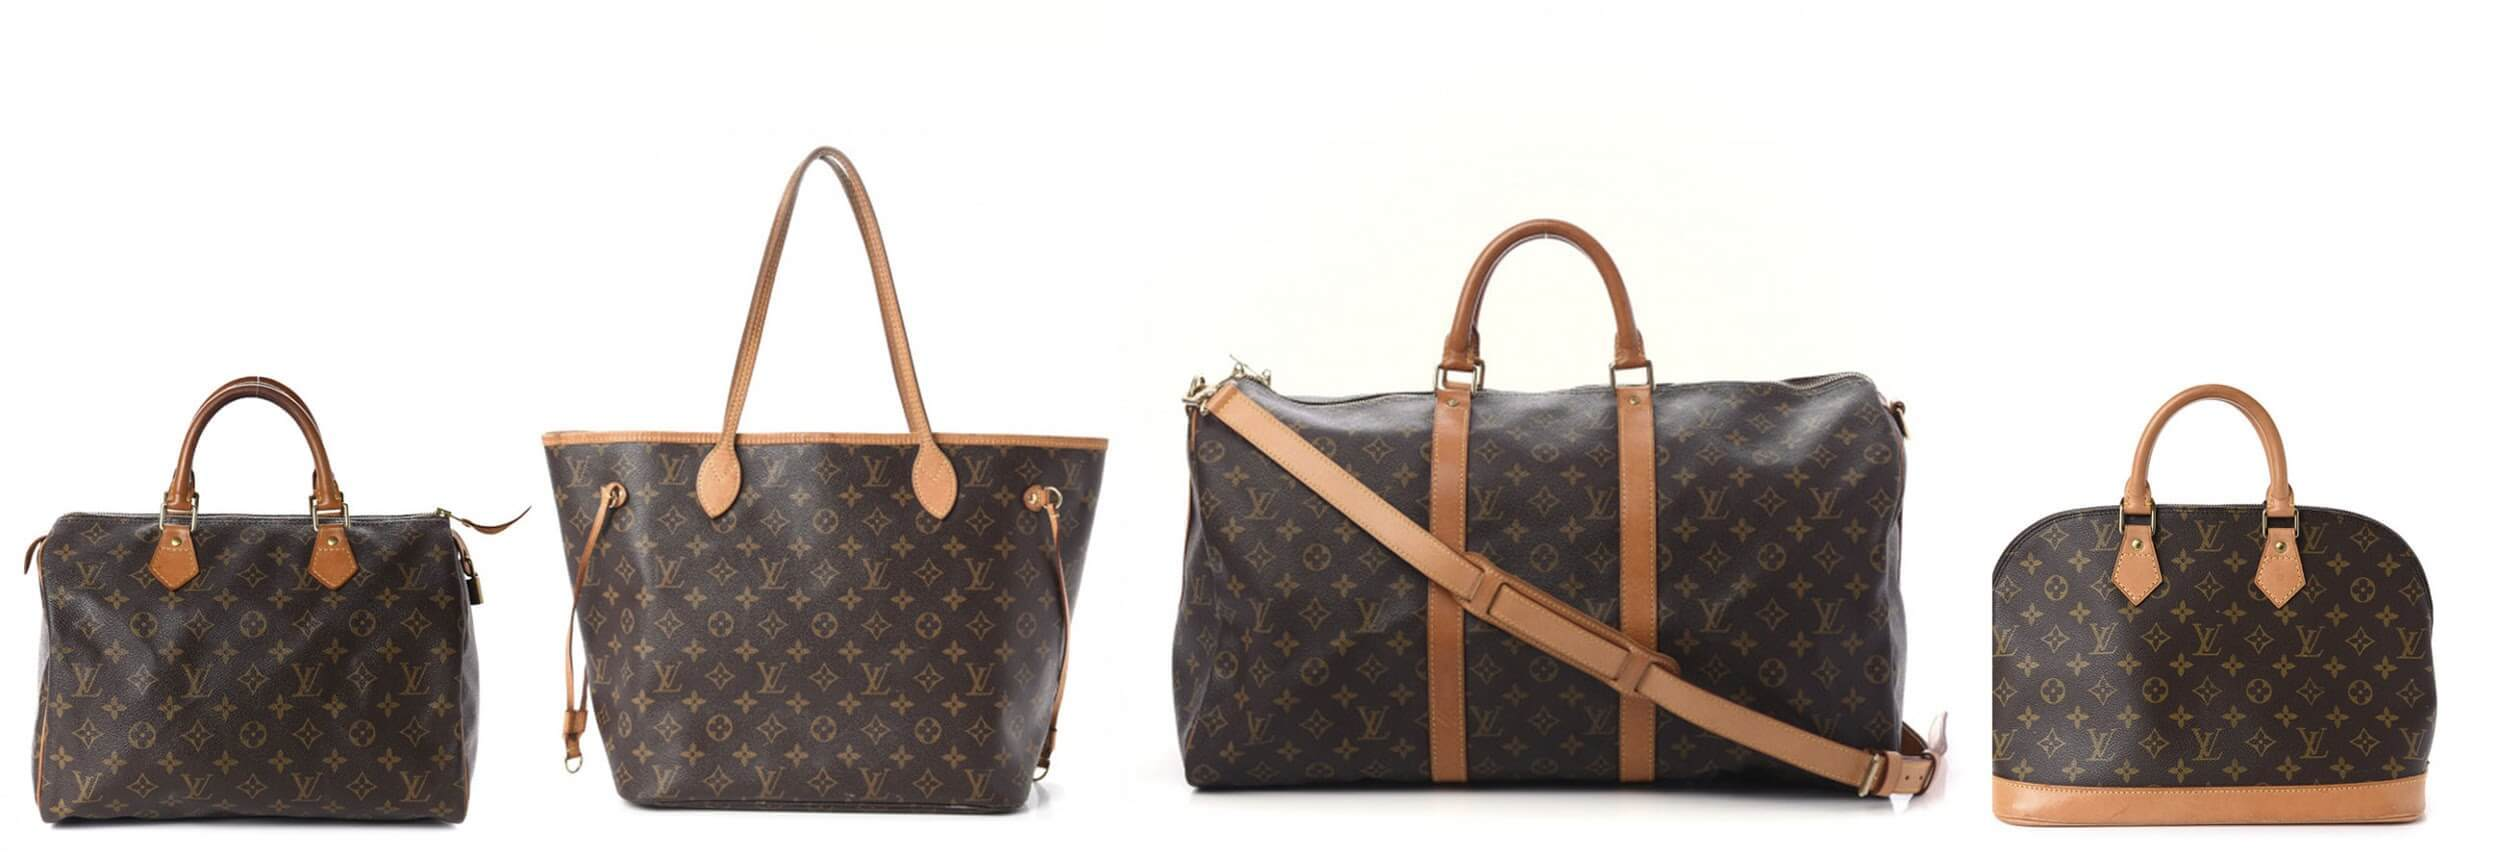 Four Louis Vuitton Bags